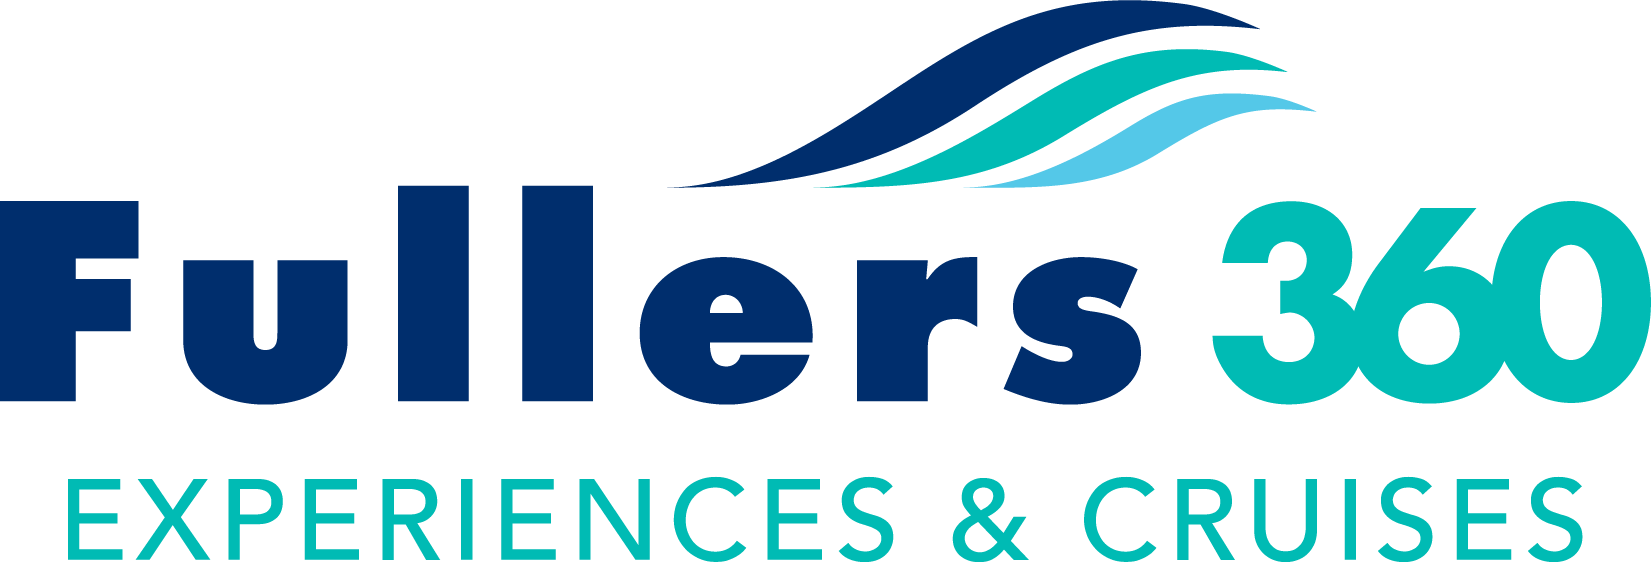 Fullers-logo-color.png